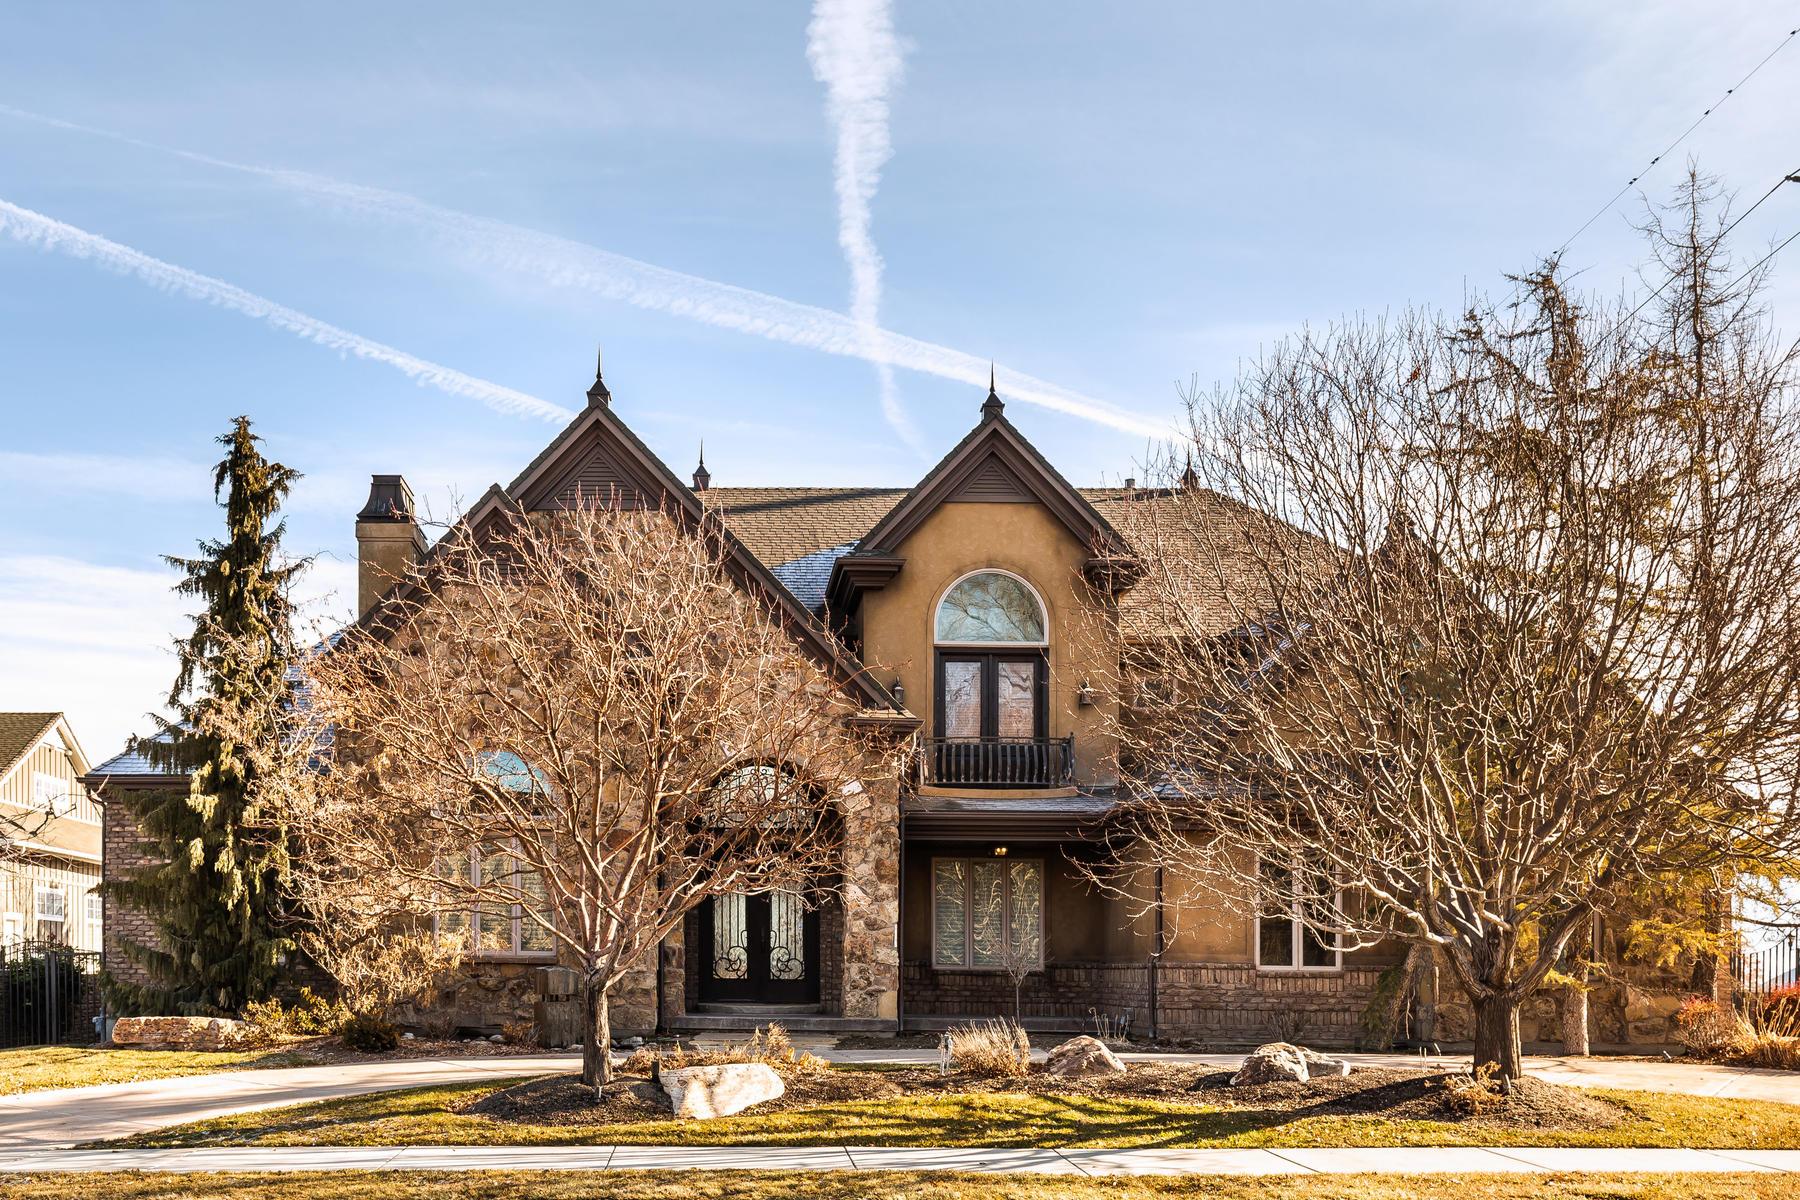 Single Family Homes for Sale at Pristine Award Winning Elegant Home 11383 S Portobello Rd South Jordan, Utah 84095 United States